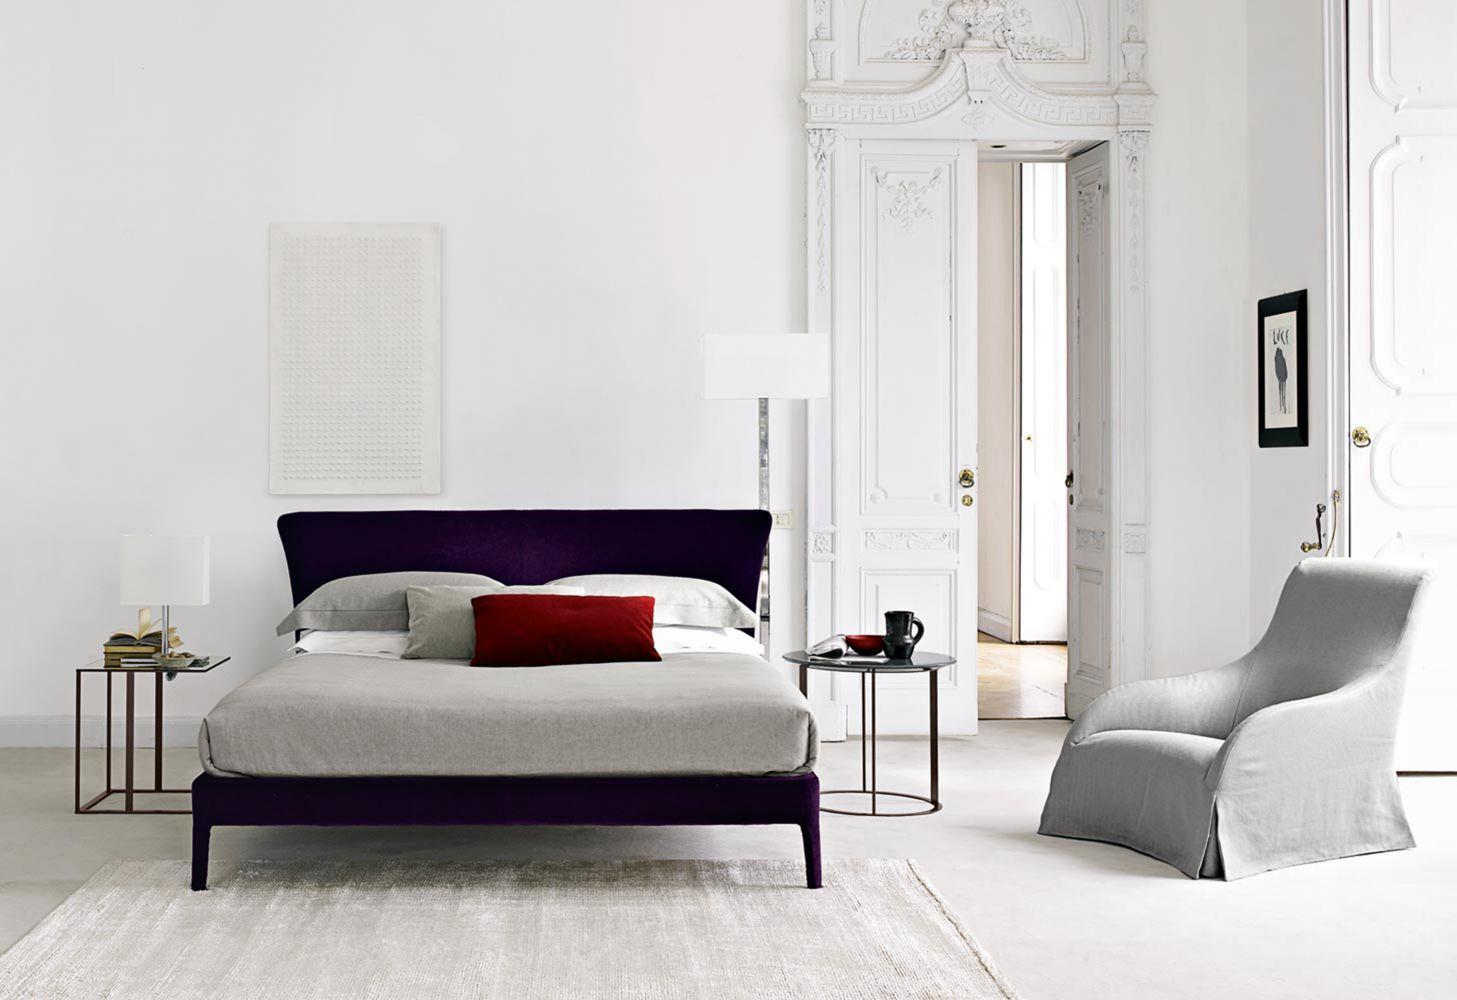 B&B Italia / Gärtner Internationale Möbel